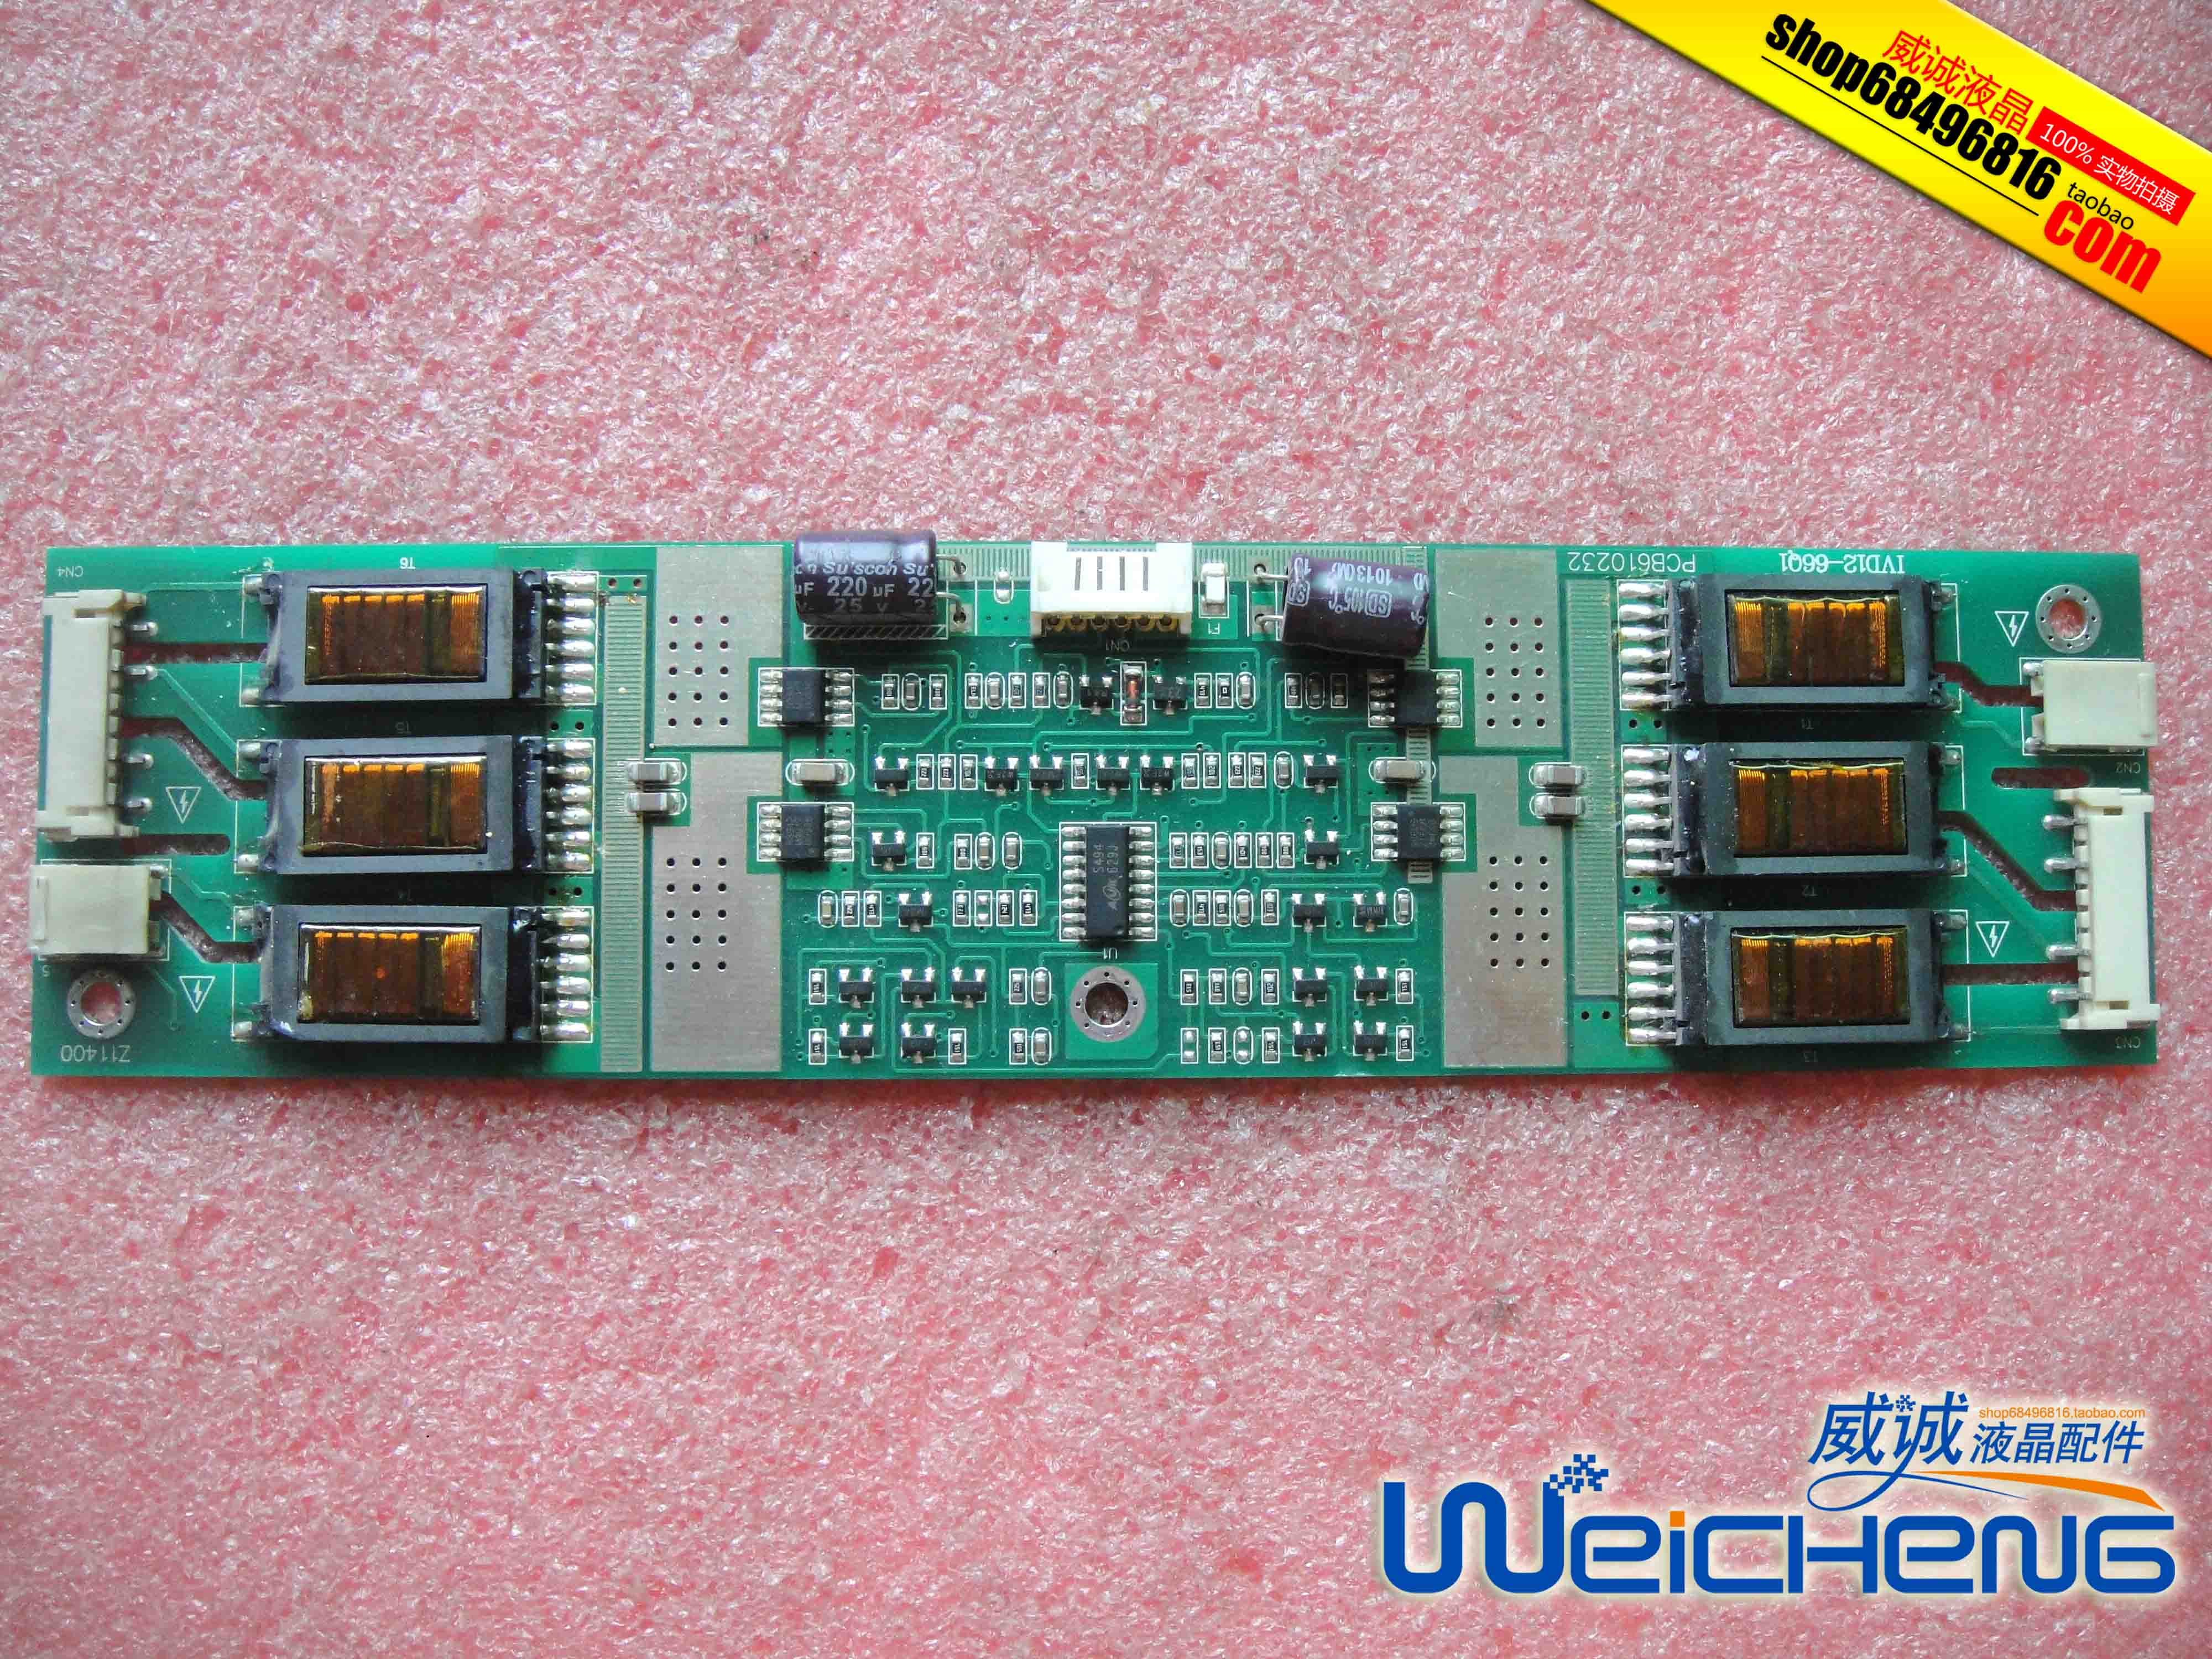 IVD12-66Q1 PCB610232 عالية ضغط قطاع